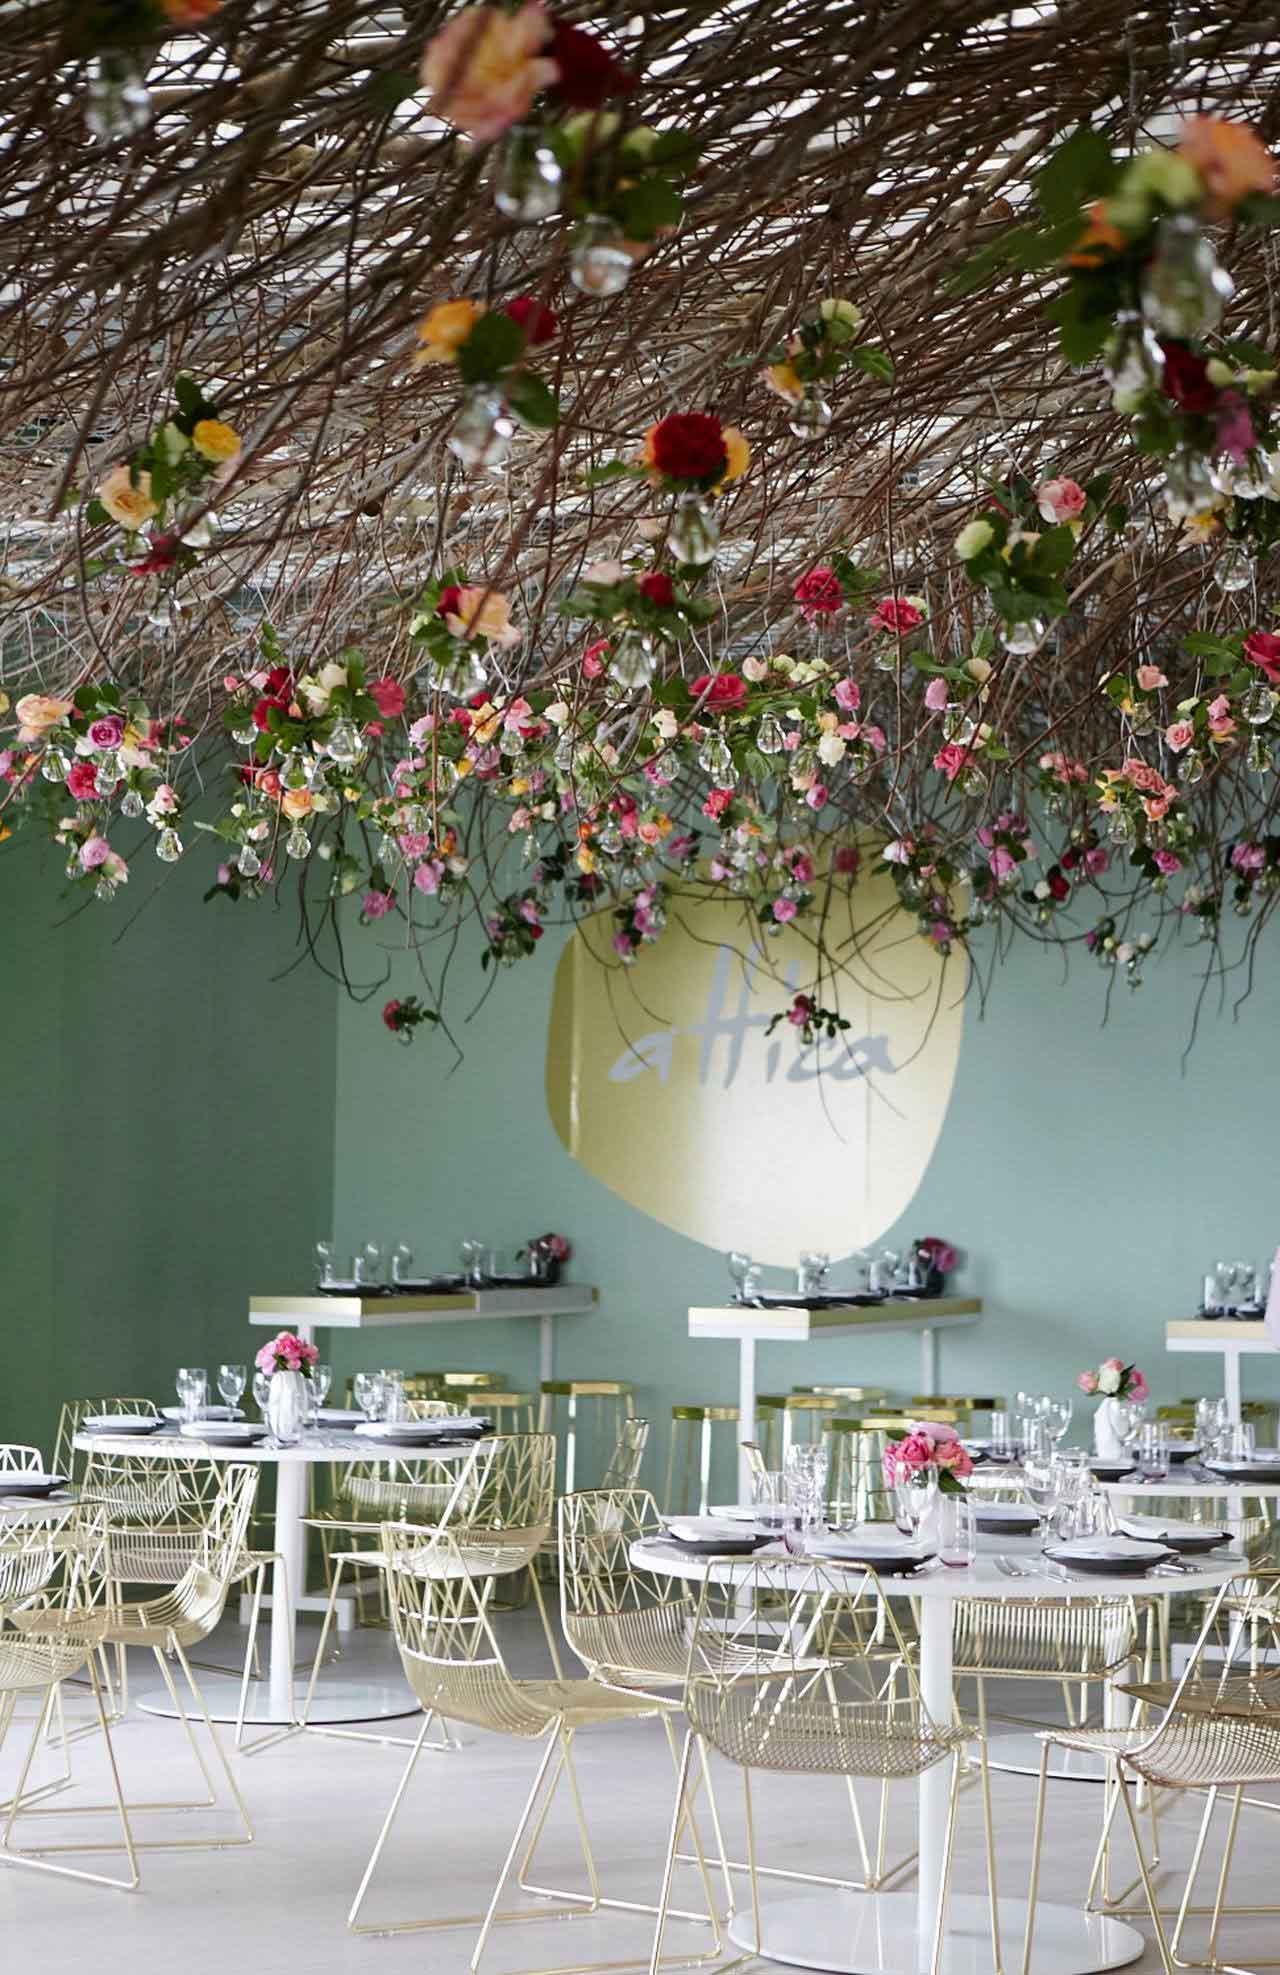 Lexus Design Pavilion By Mim Design. Photo Courtesy Of Chloe Paul U0026 Lexus  Australia  